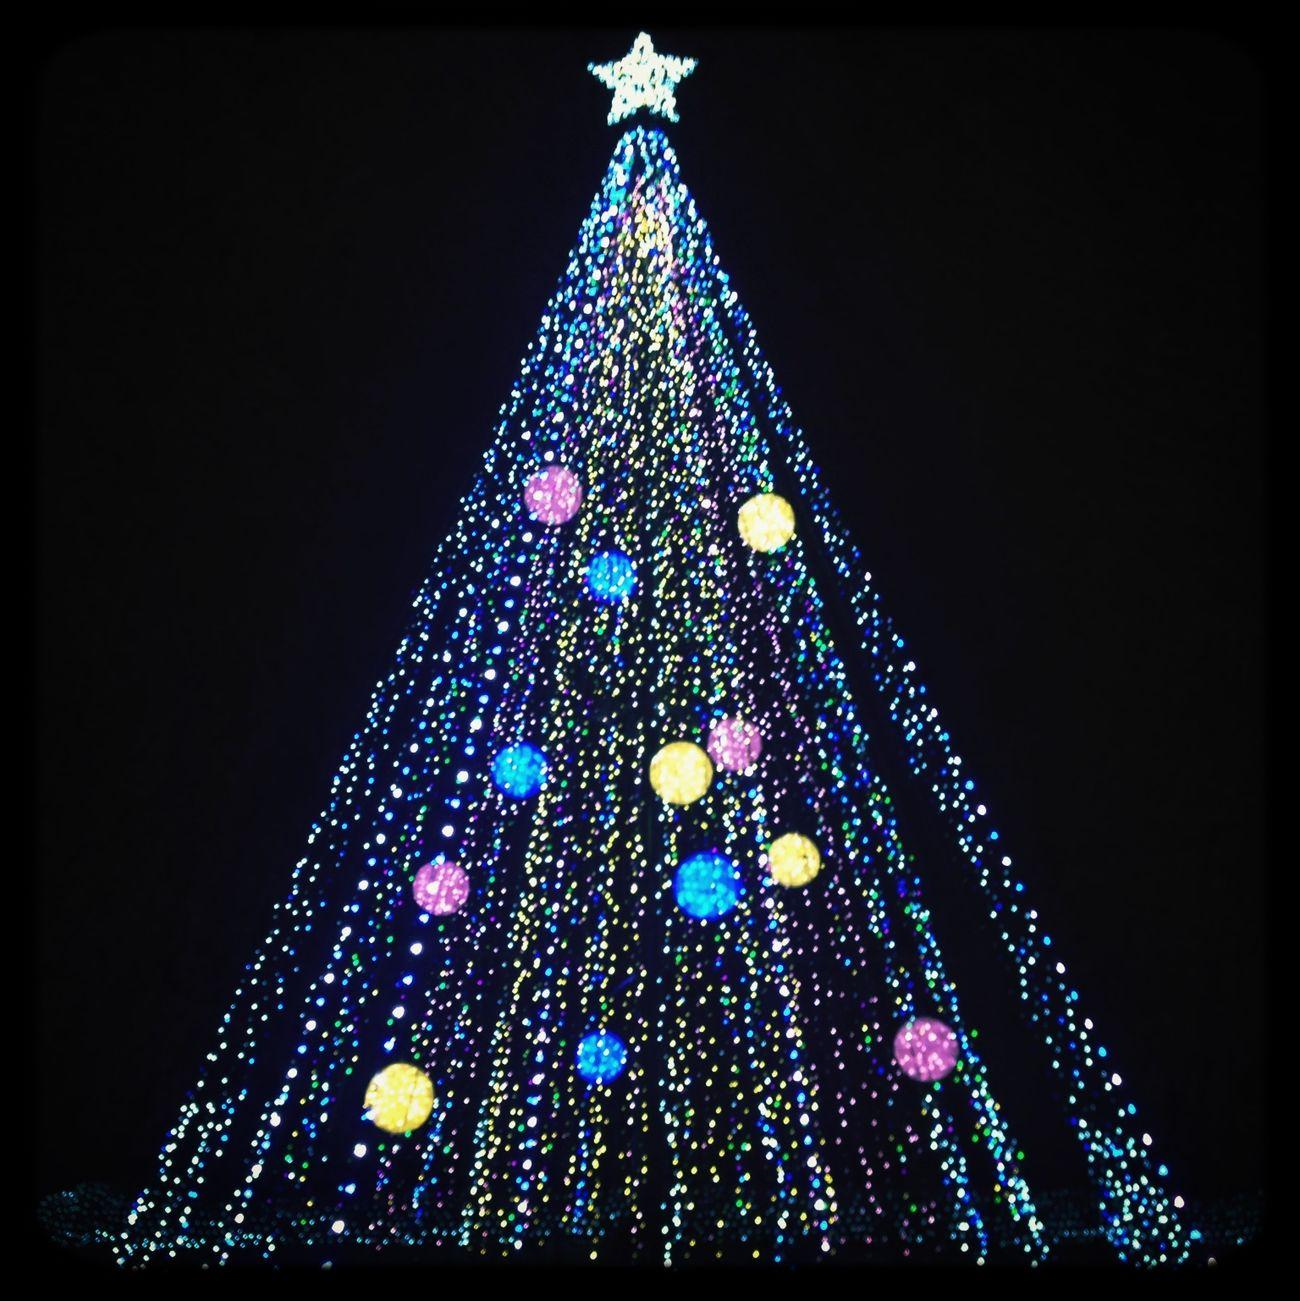 Merry Christmas! Colorful Japan